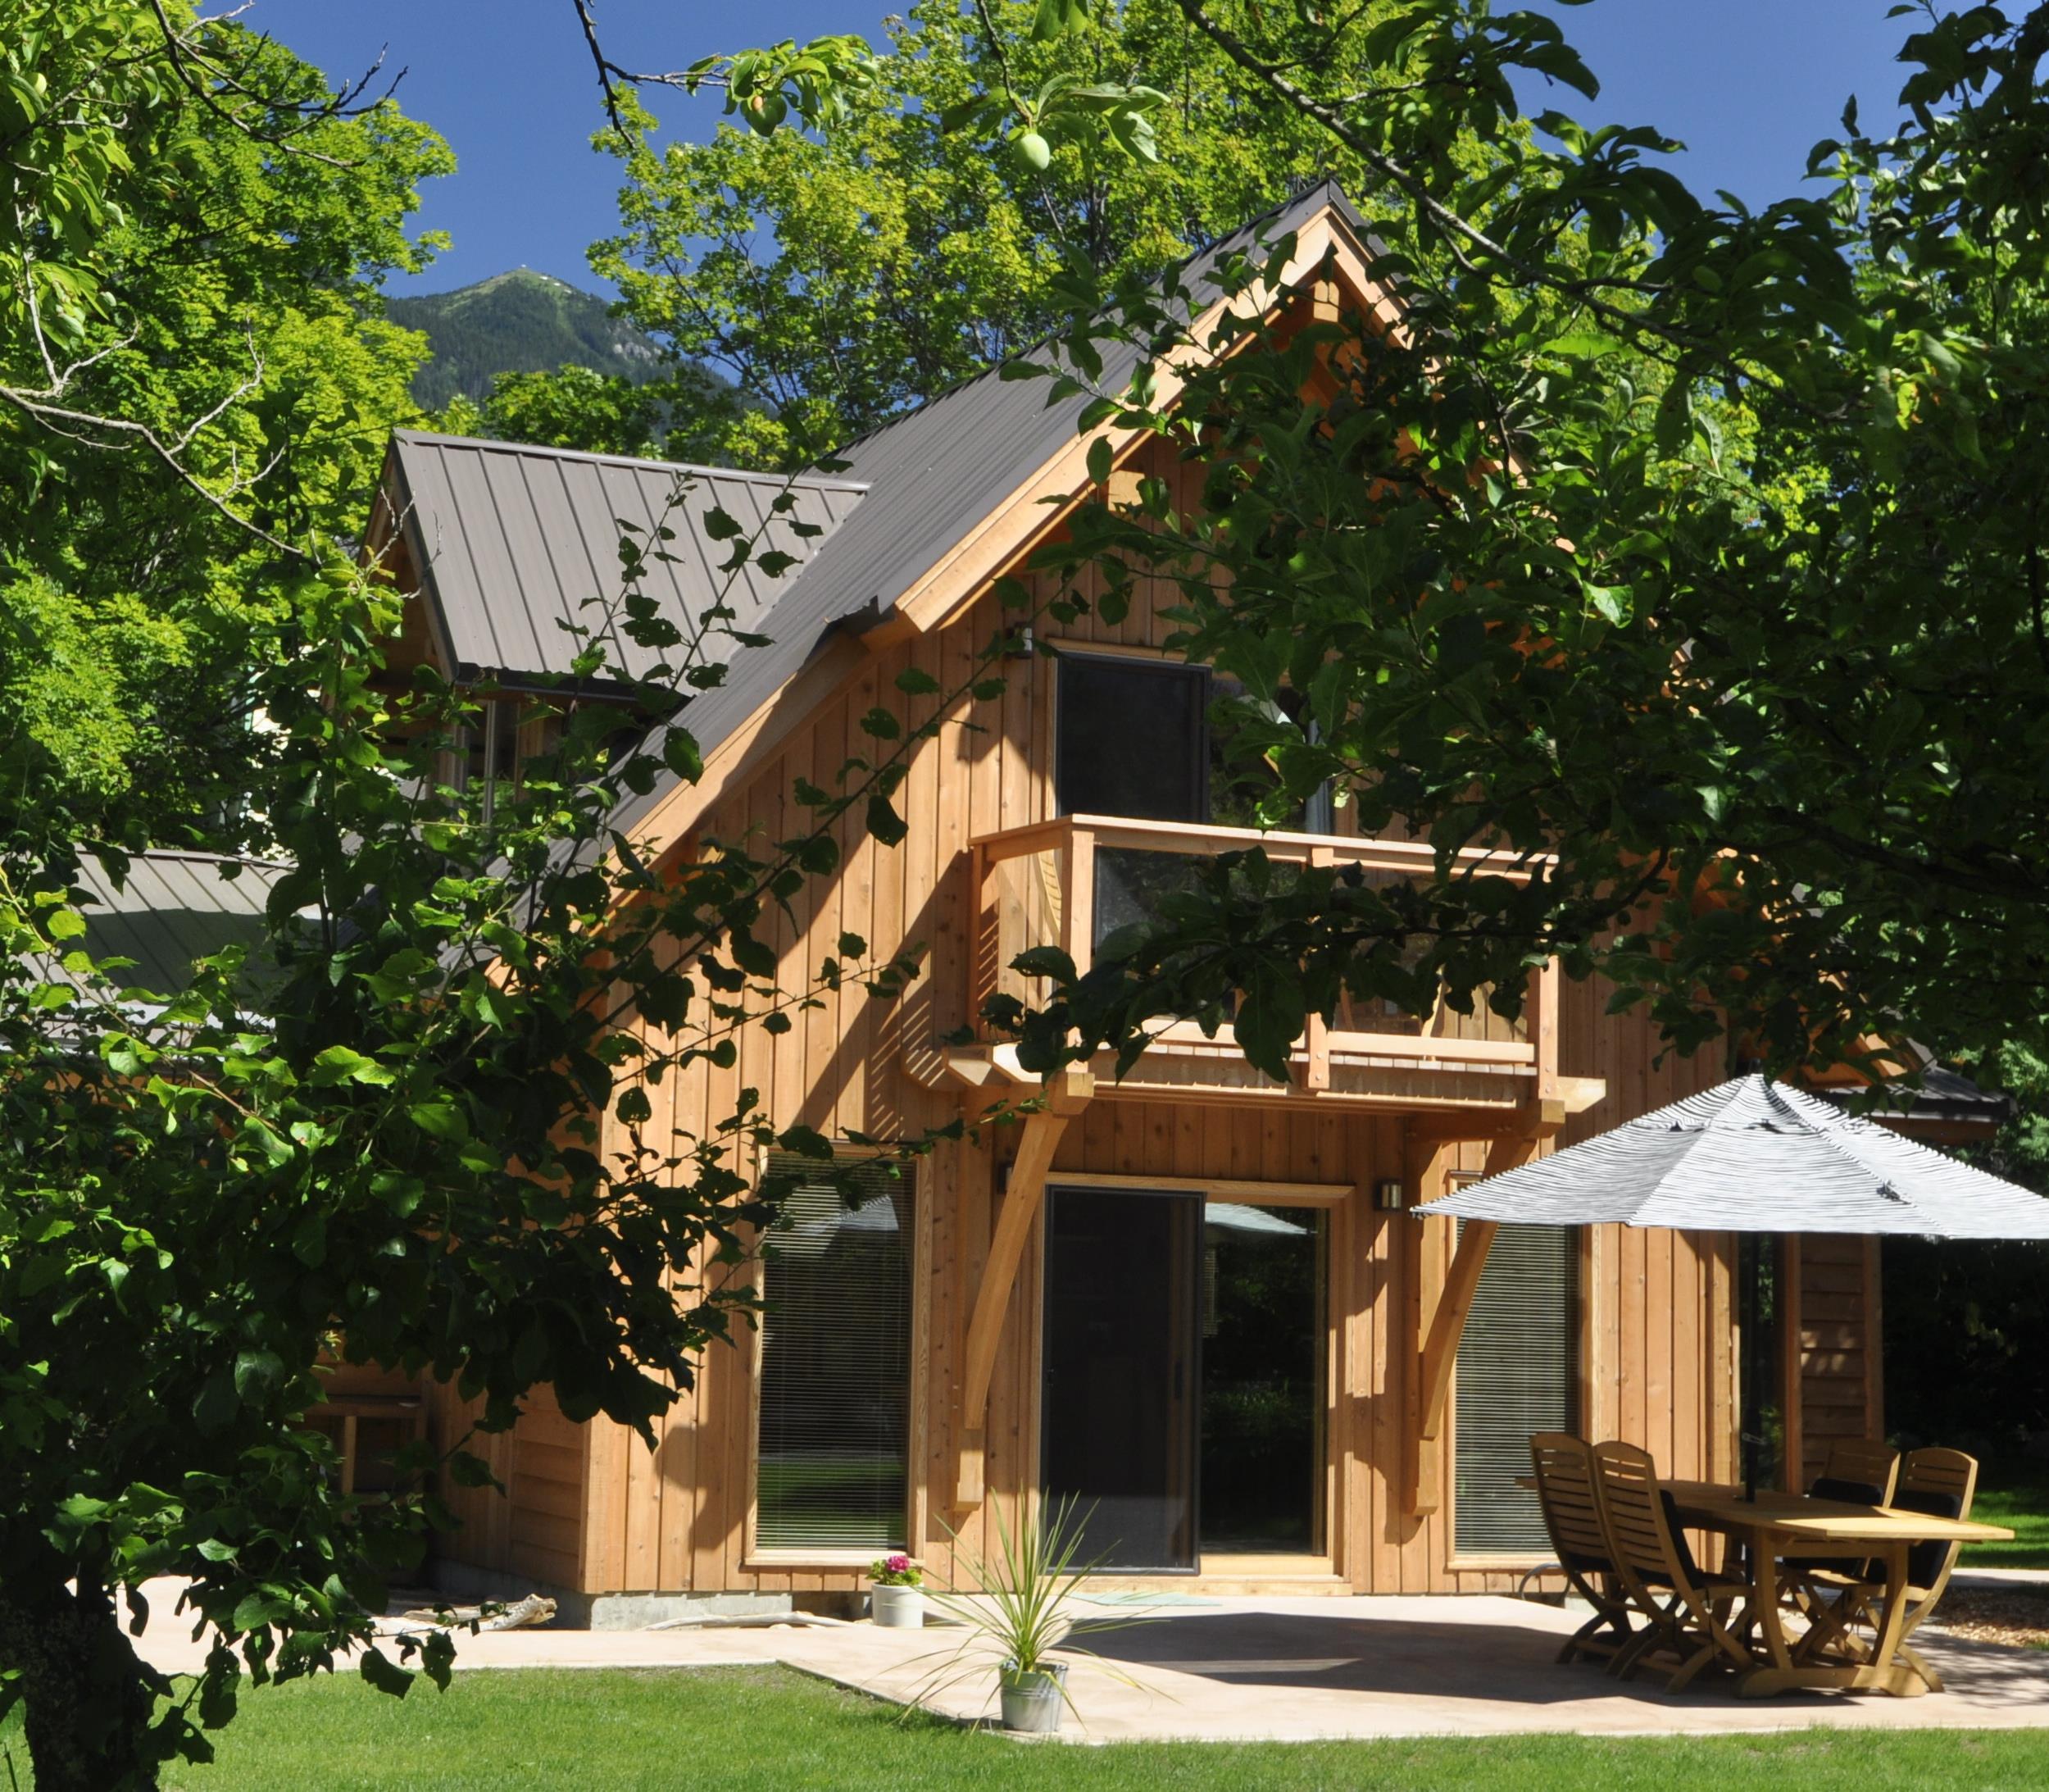 Home - Alberta Real Estate Foundation